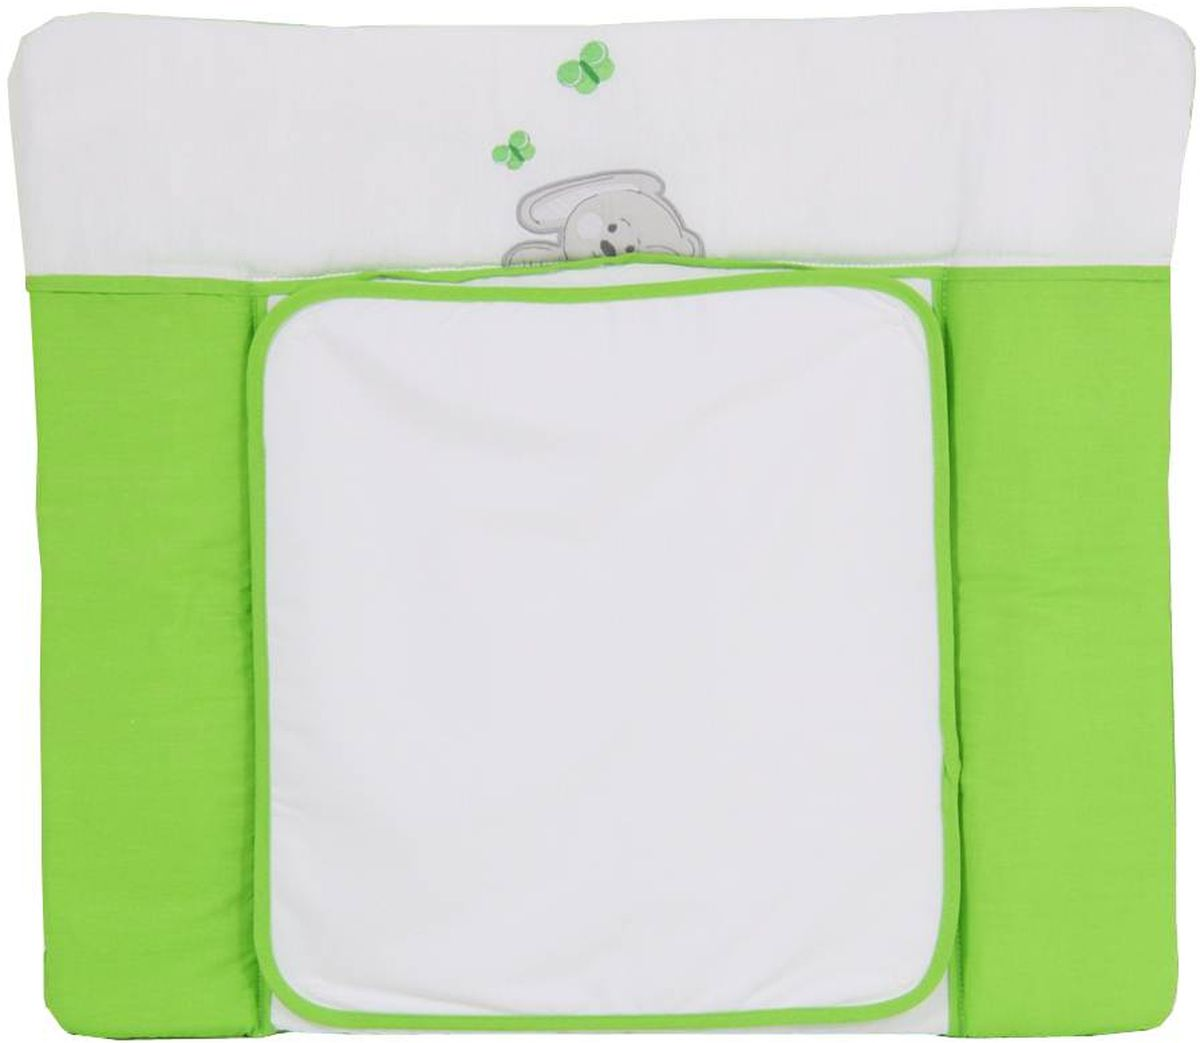 Polini Доска пеленальная Зайки цвет зеленый 0001350-4